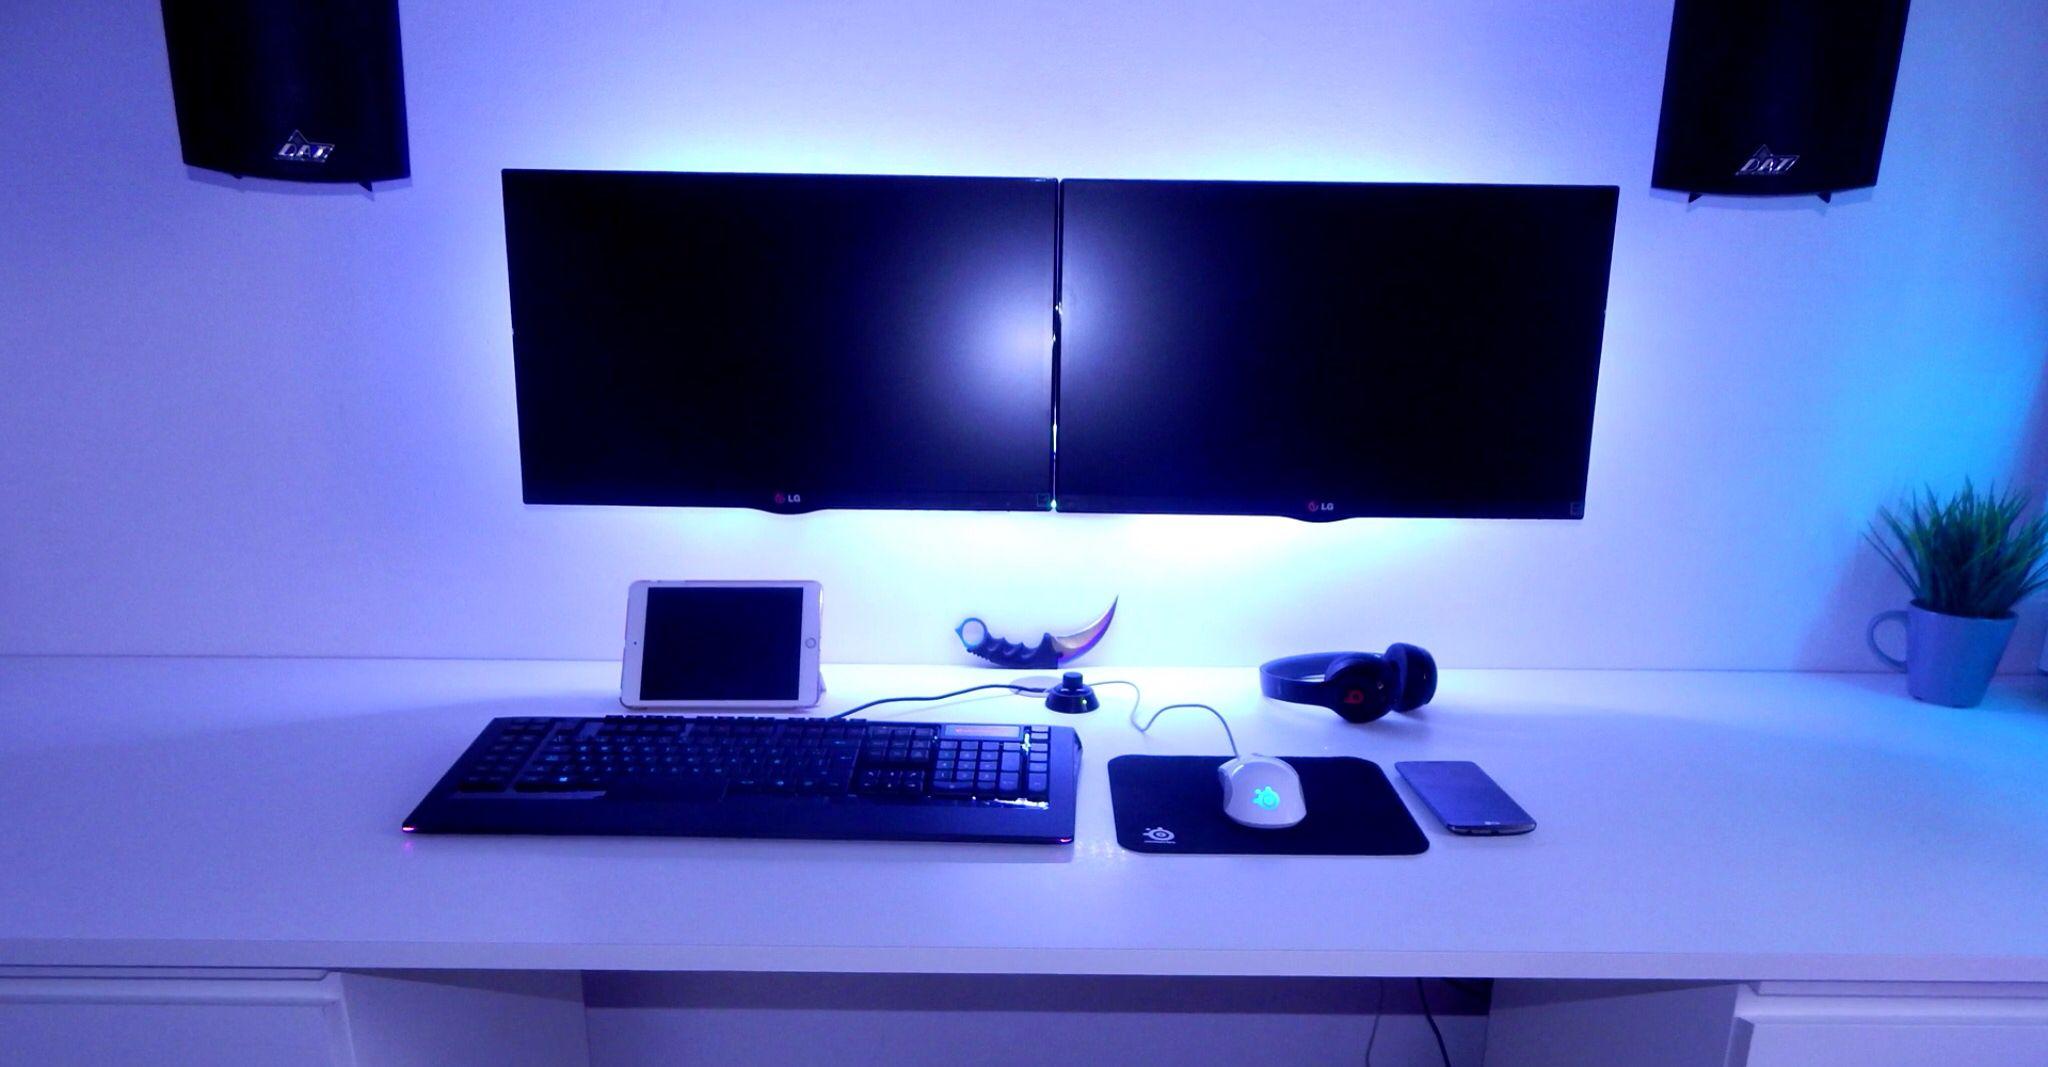 how to use a double monitor setup